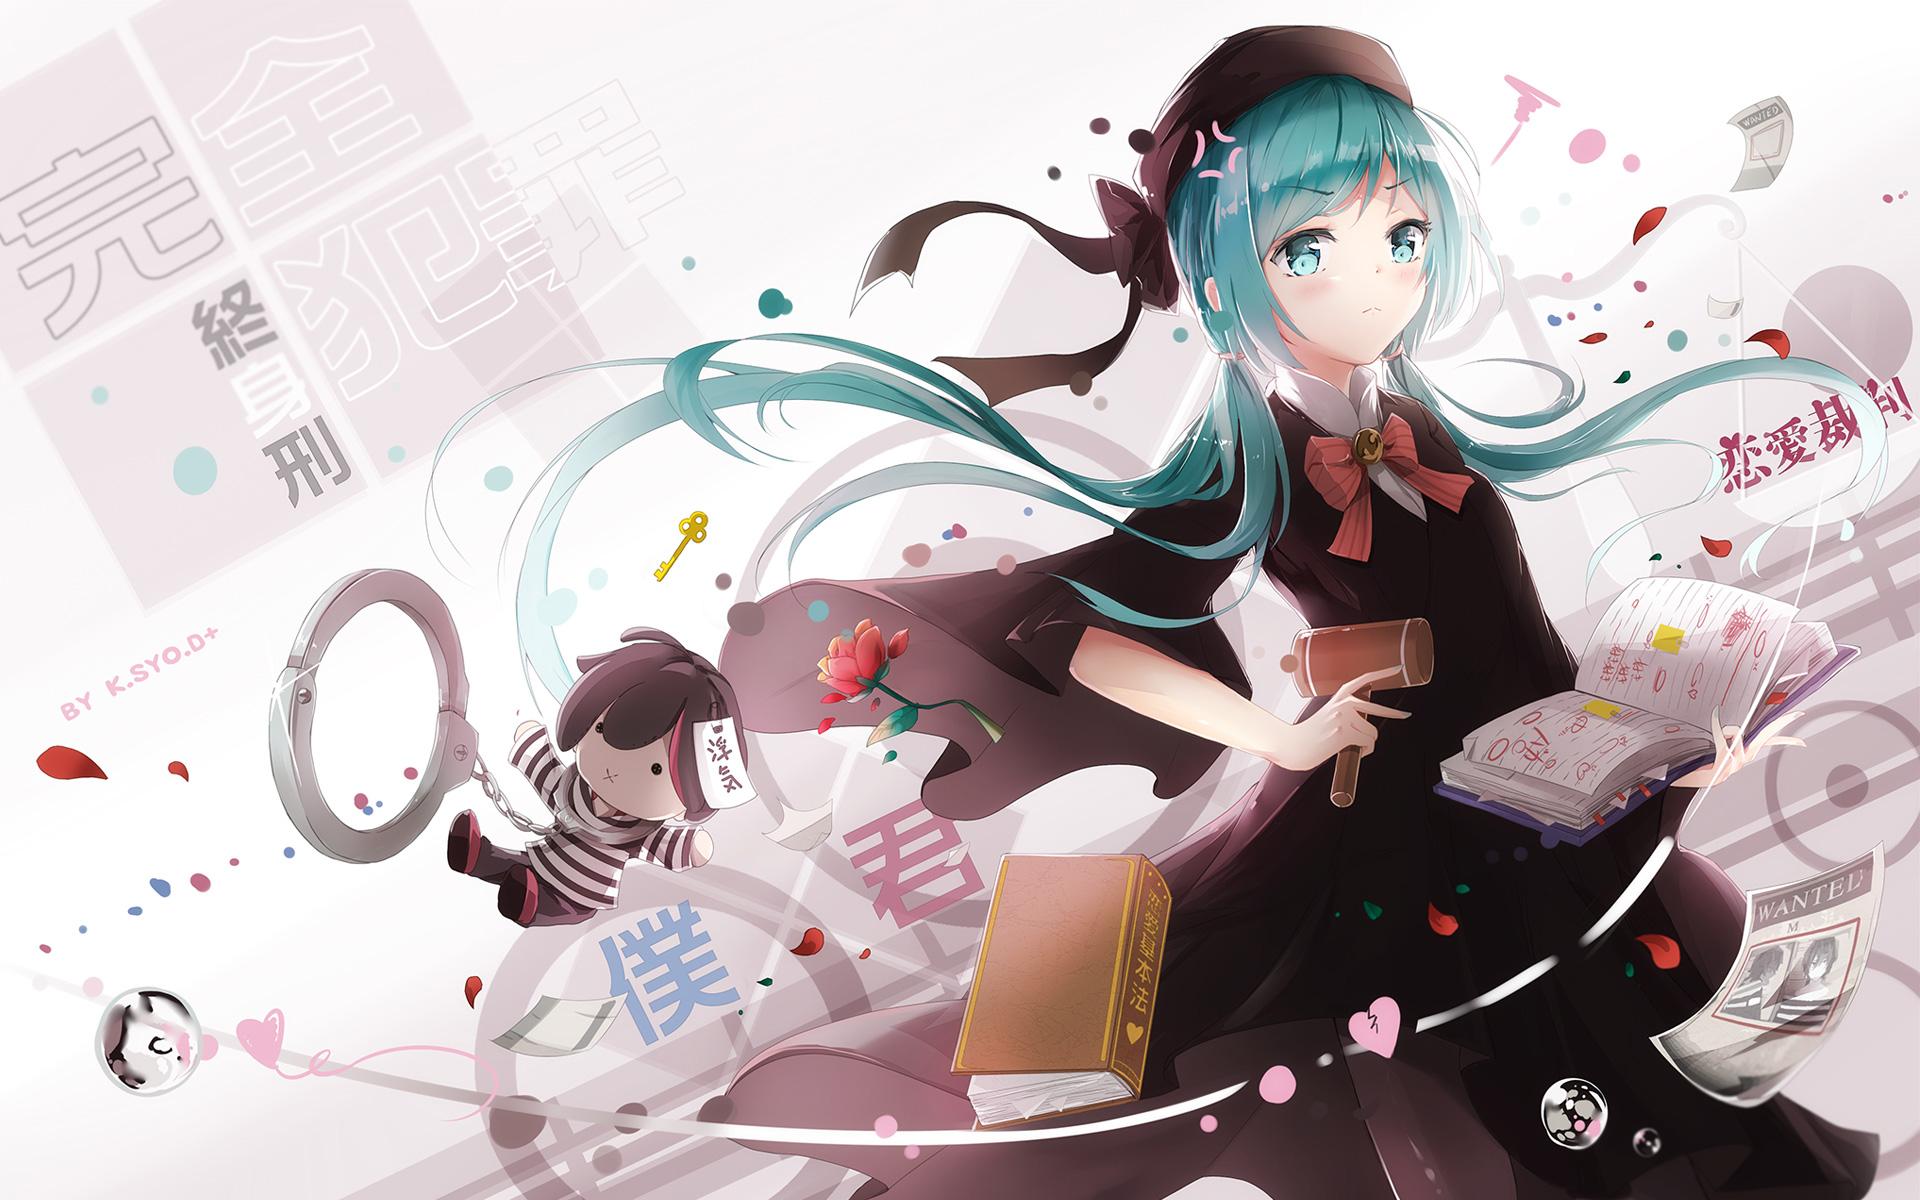 Anime Girl Hug Love Wide Wallpapers Vocaloid Hatsune Miku Wallpapers Hd Wallpapers Id 17708